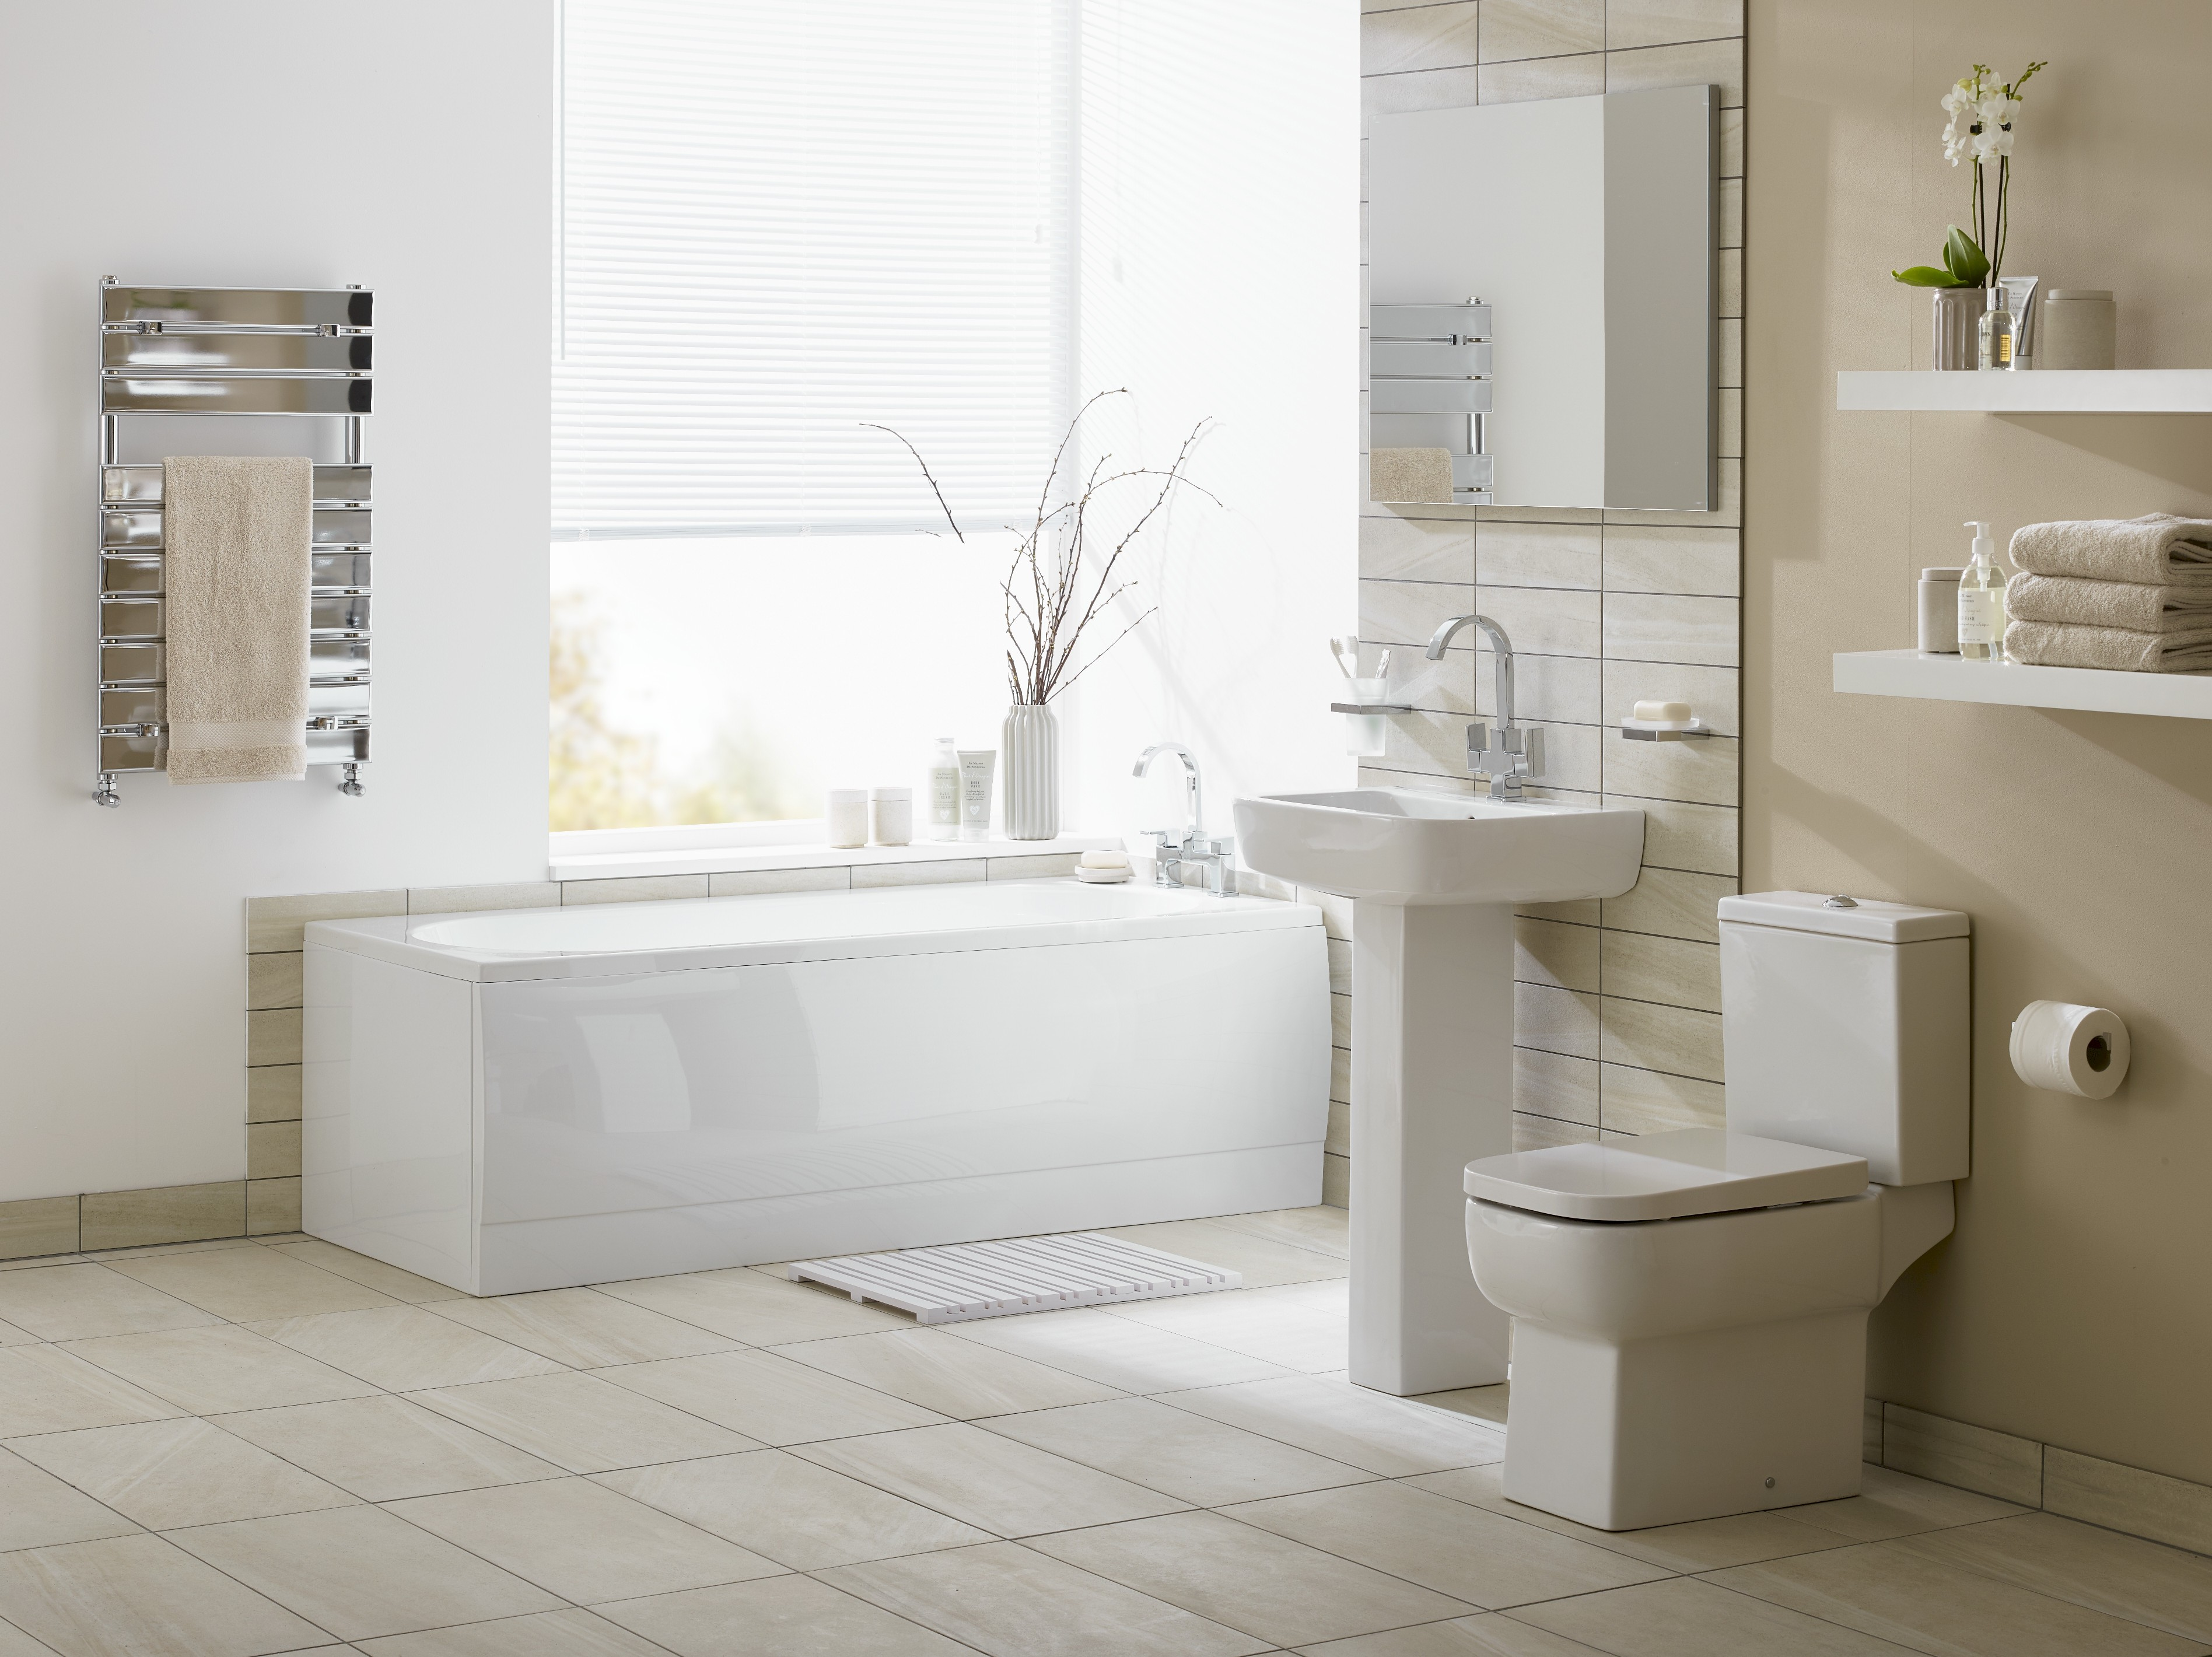 Eastbourne Bathrooms & Tiles - Ranges